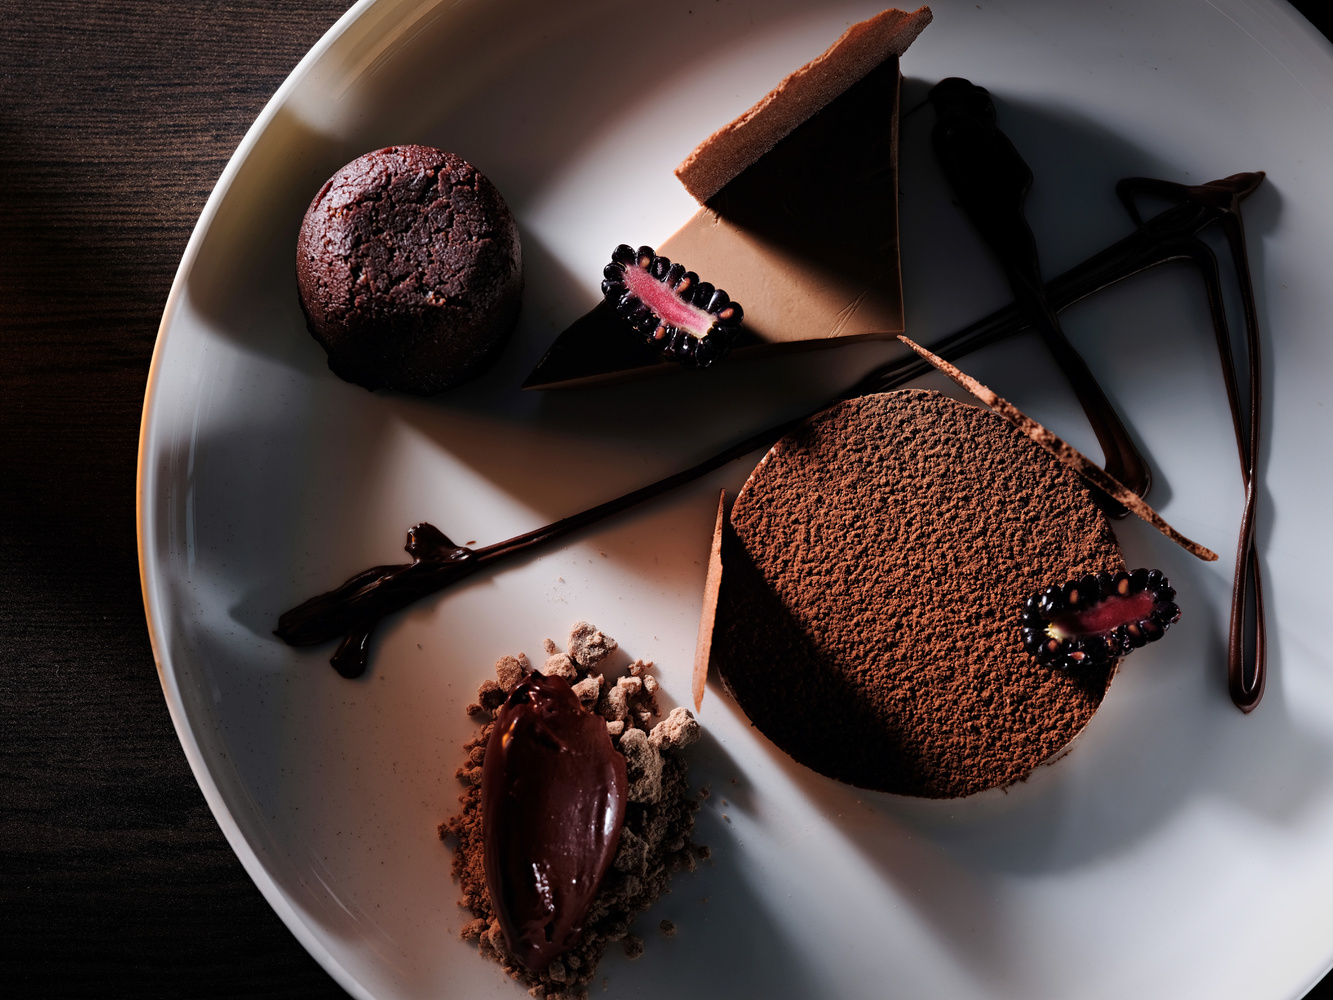 Chocolate Overload. by ivan joshua loh